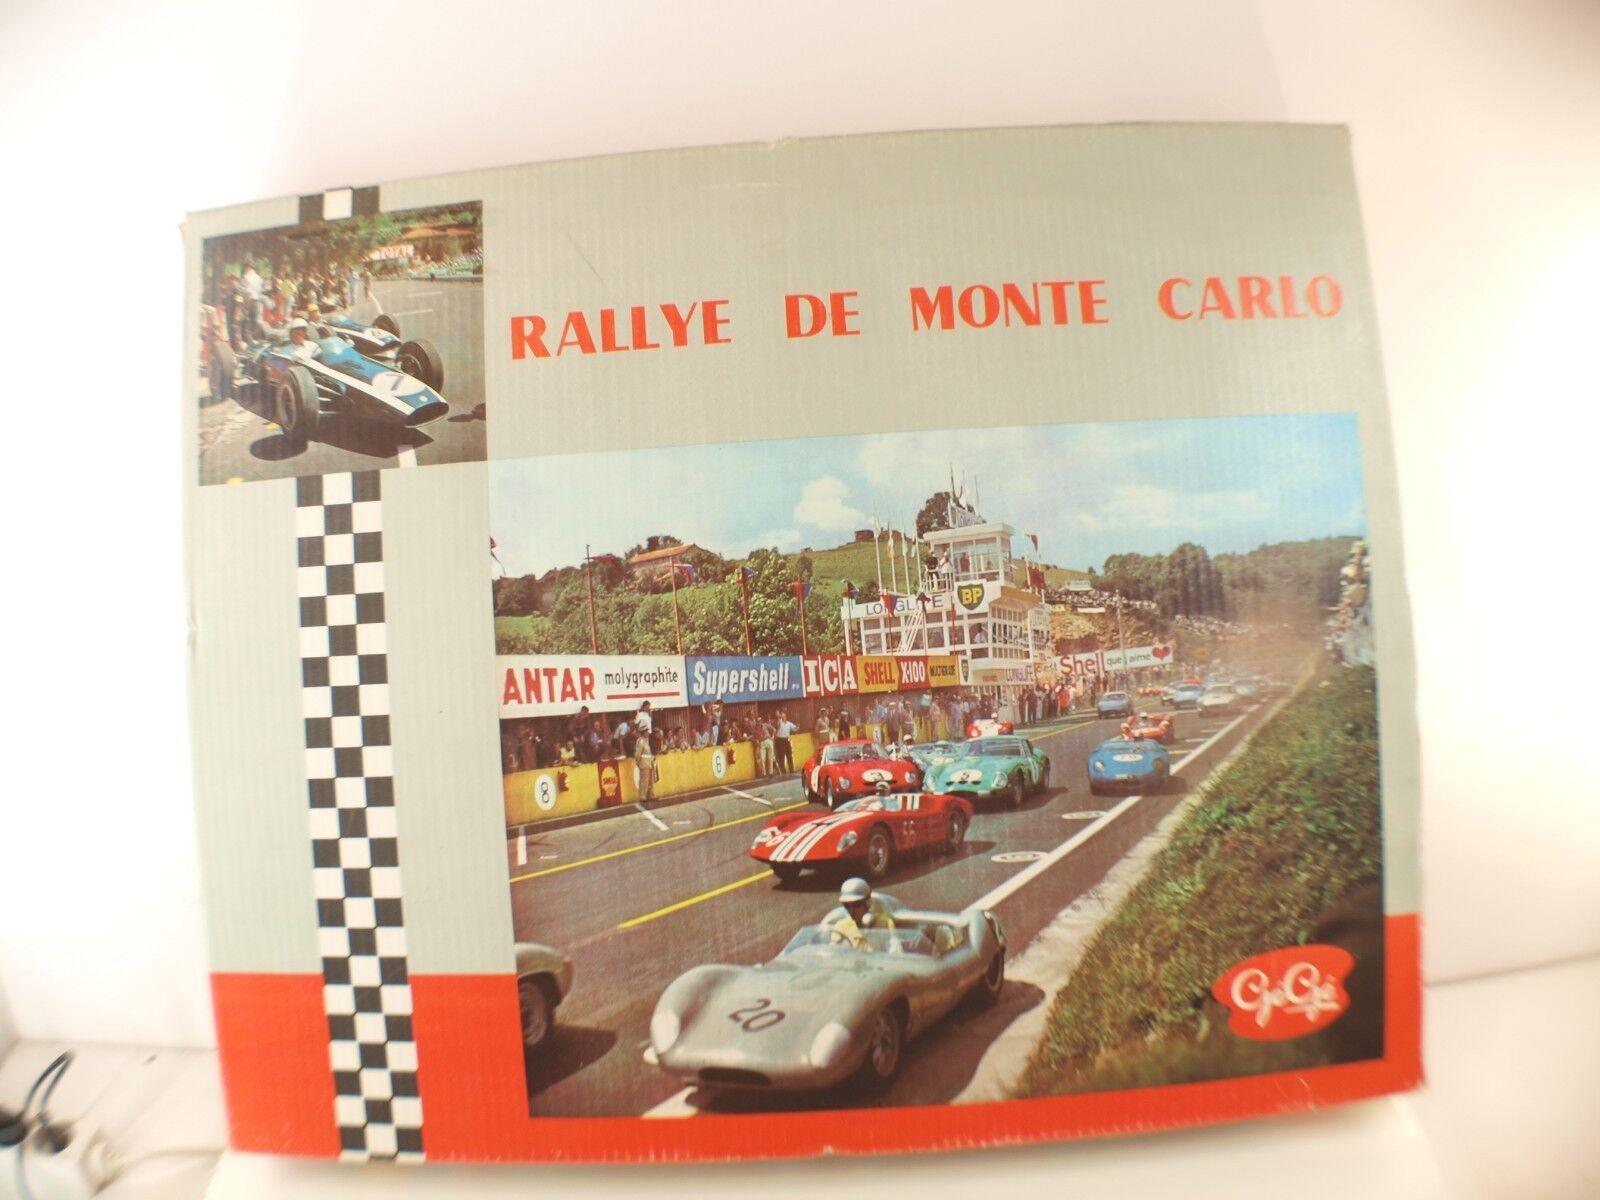 Gege - Scatola' Rally Montecarlo' 2 Vintage Slot Cars